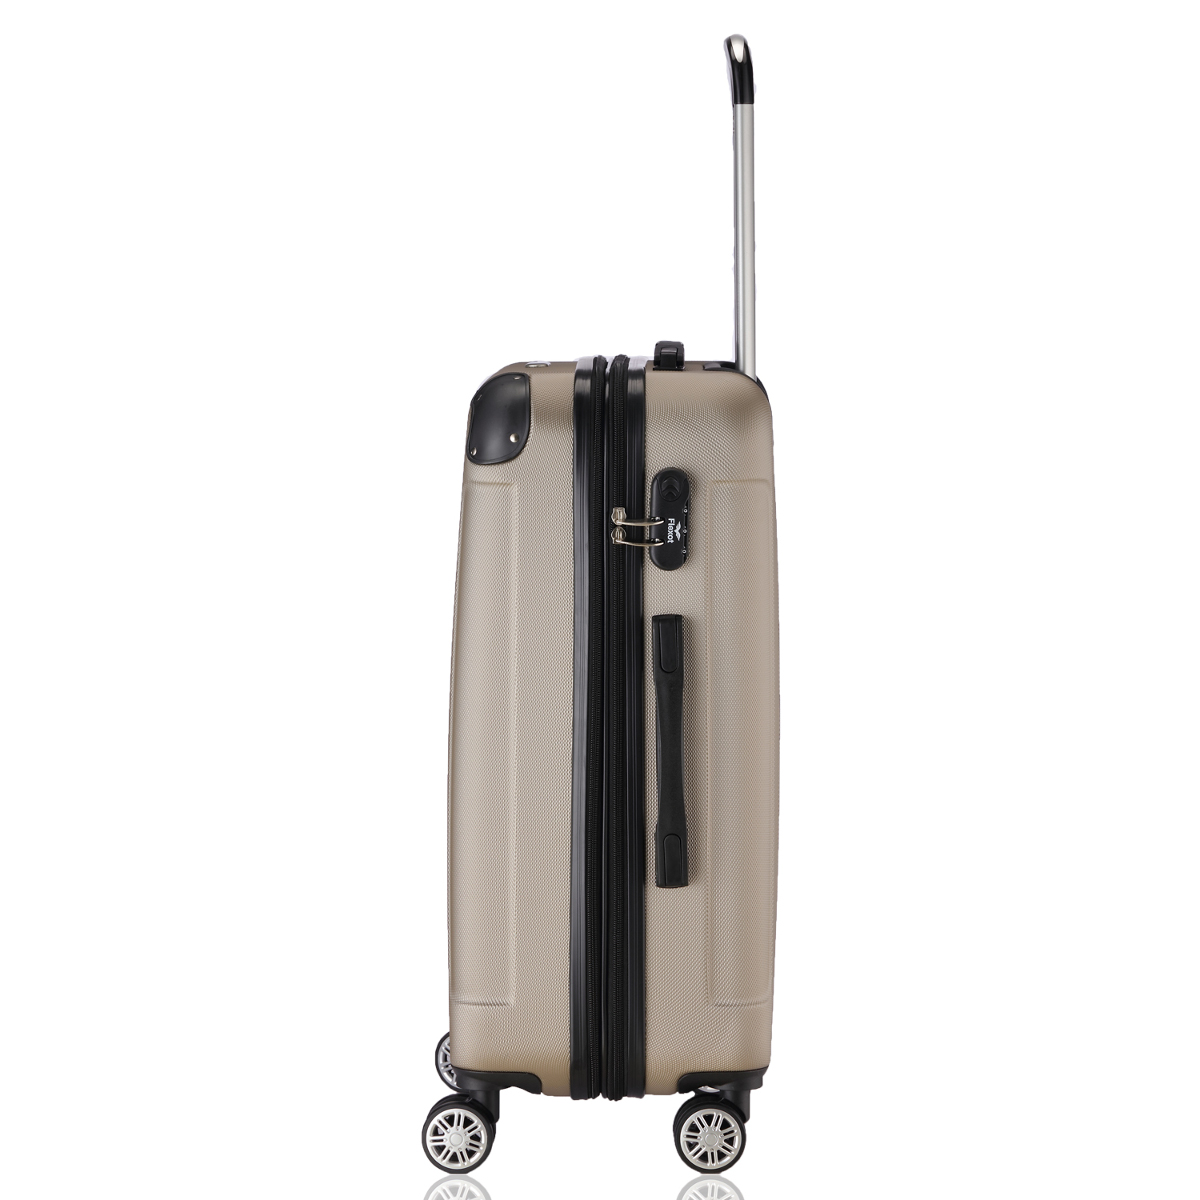 Koffer-Flexot-2045-Hartschalenkoffer-Trolley-Kofferset-Reisekoffer-M-L-XL-Set Indexbild 48